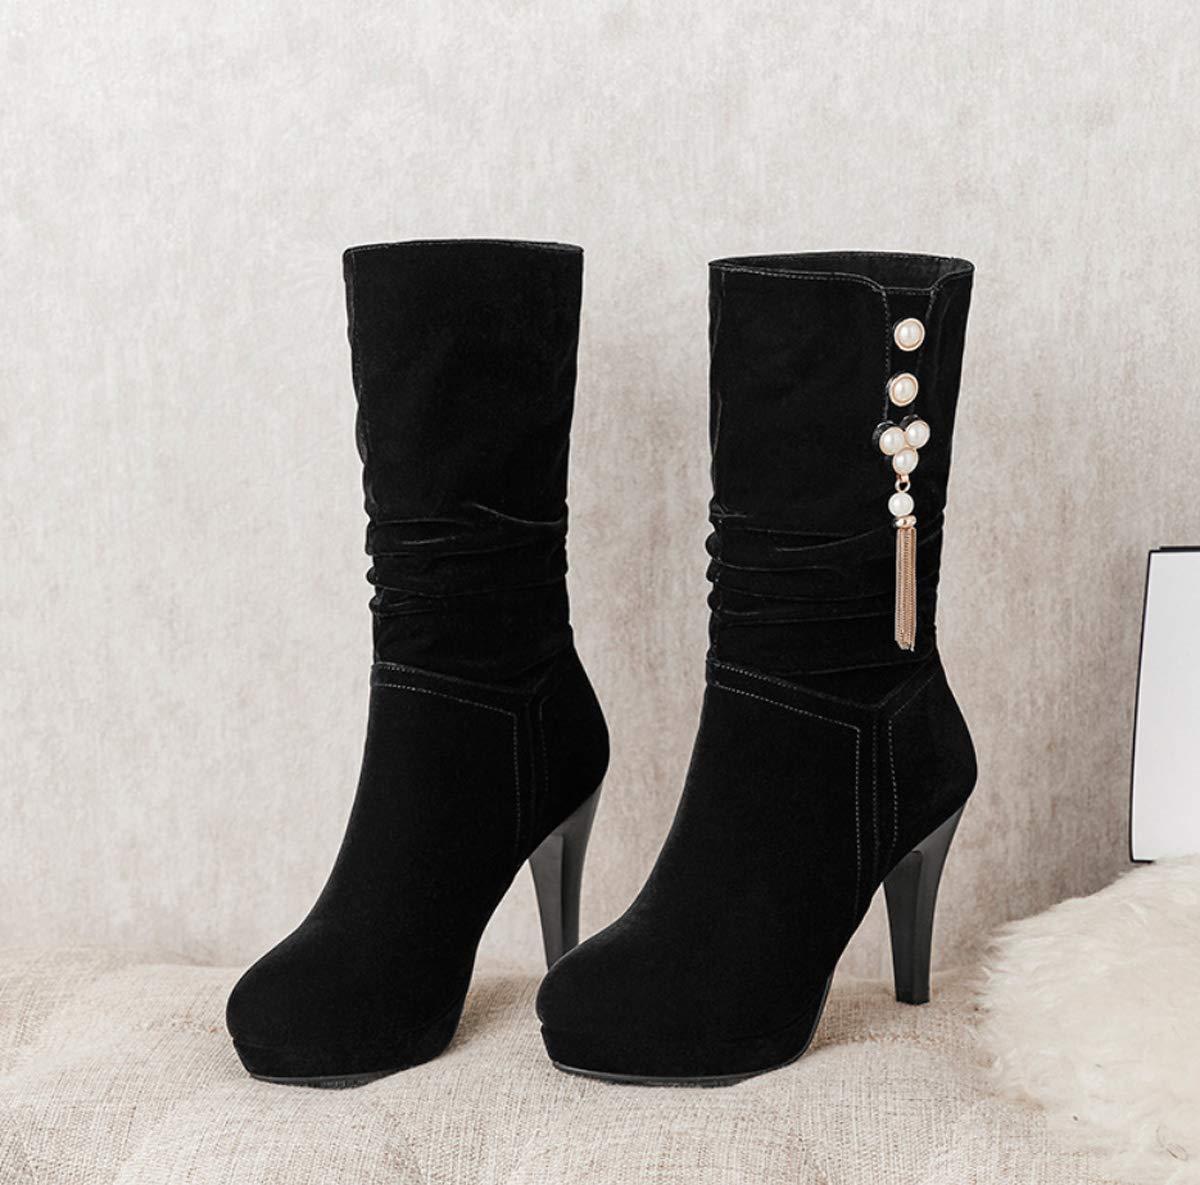 DANDANJIE Damenstiefel High Heel Mid Mid Mid Calf Stiefel Winter Damen Perle Stiletto Absatzschuhe Schwarz 5df244